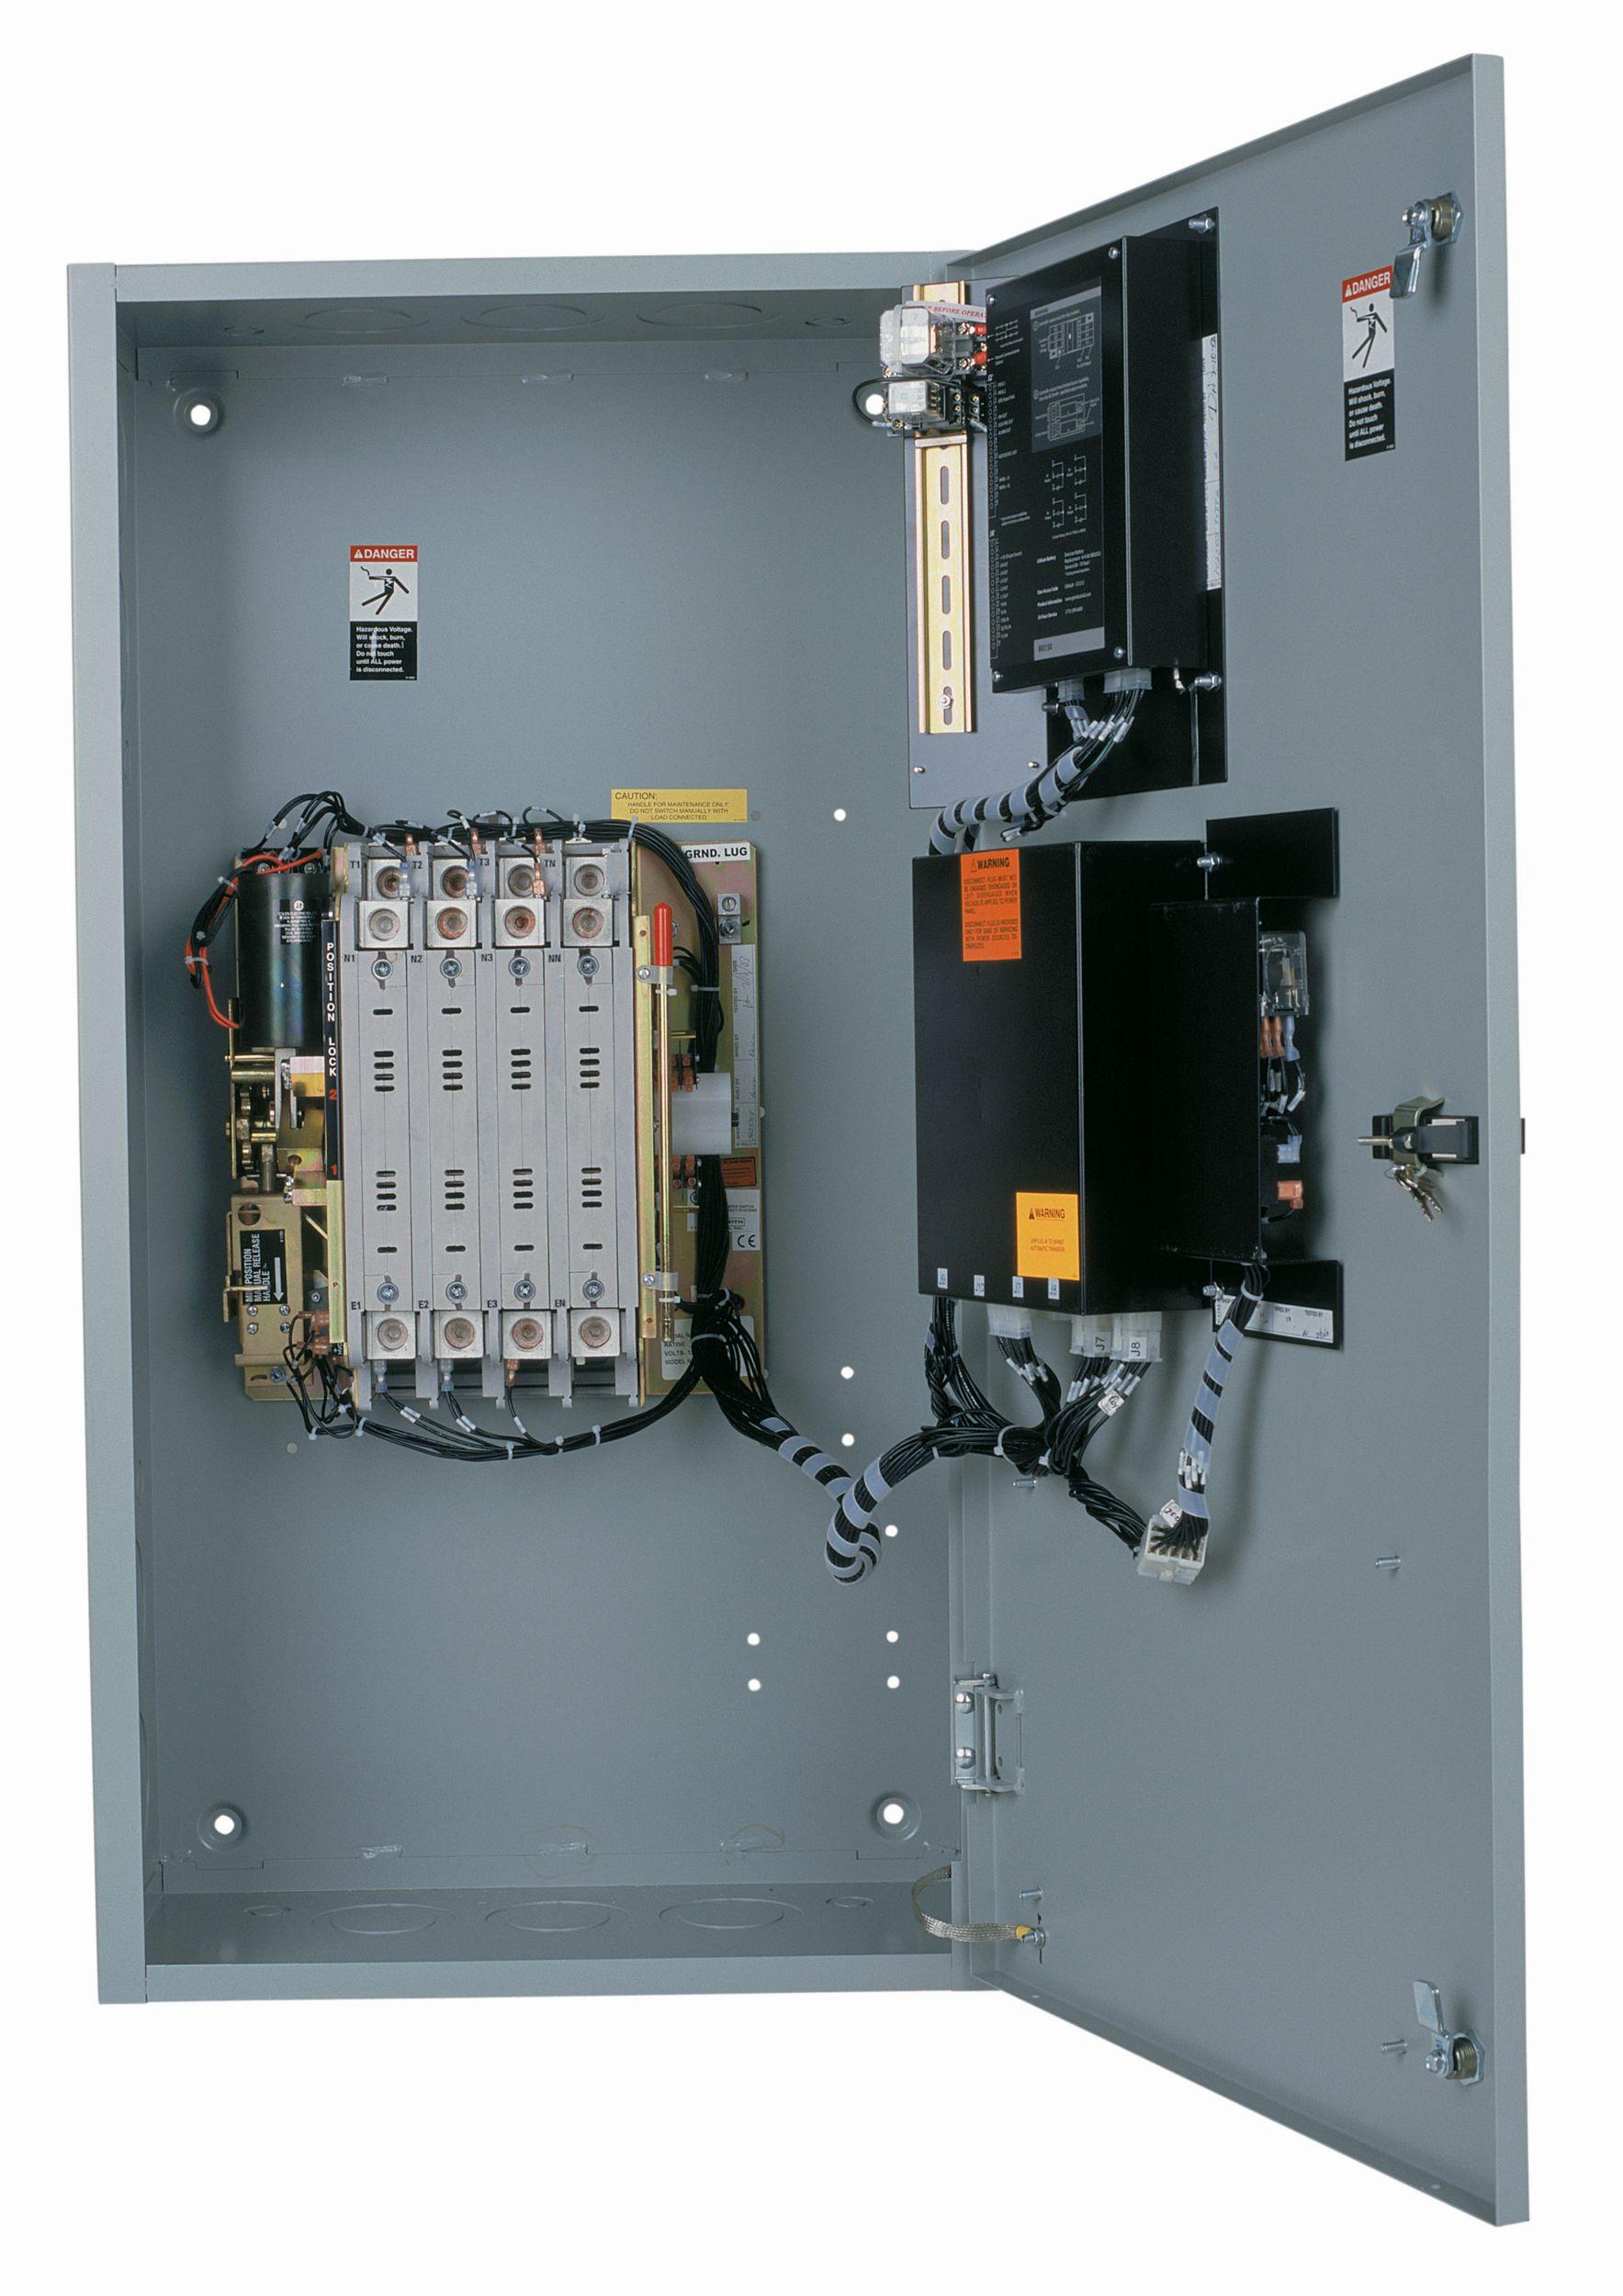 110 Cc Wiring Diagram Cat Ctg Series Automatic Transfer Switch Caterpillar